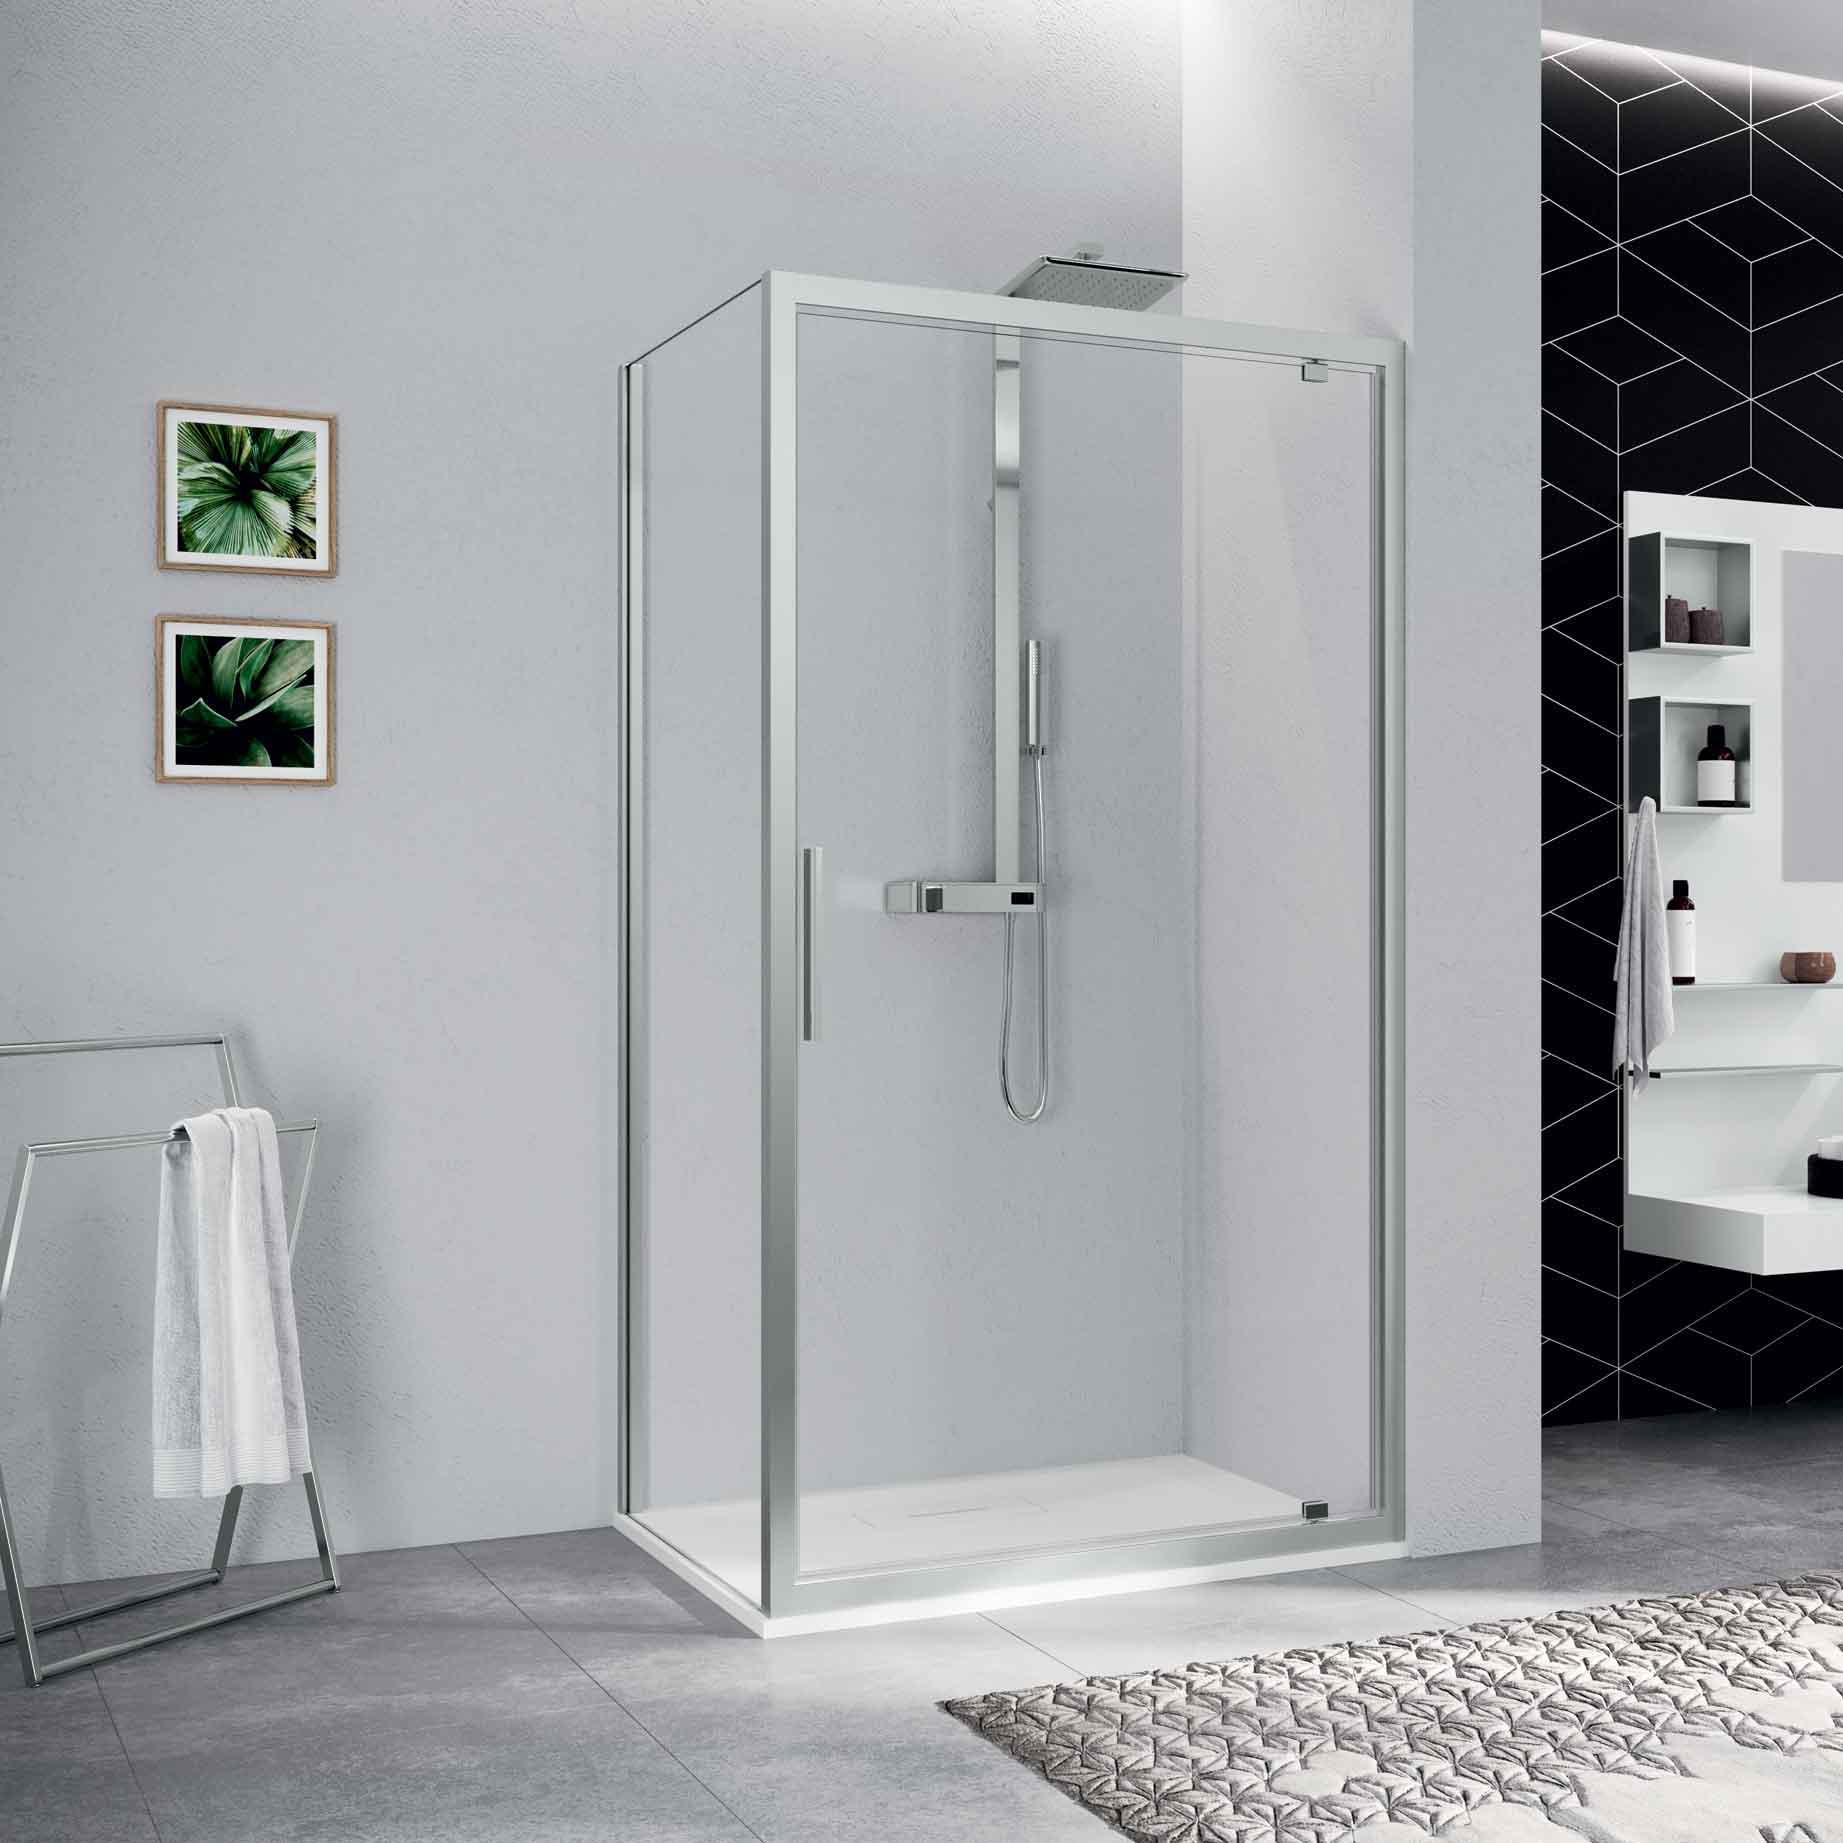 sopravasca aurora 6 novellini. Black Bedroom Furniture Sets. Home Design Ideas